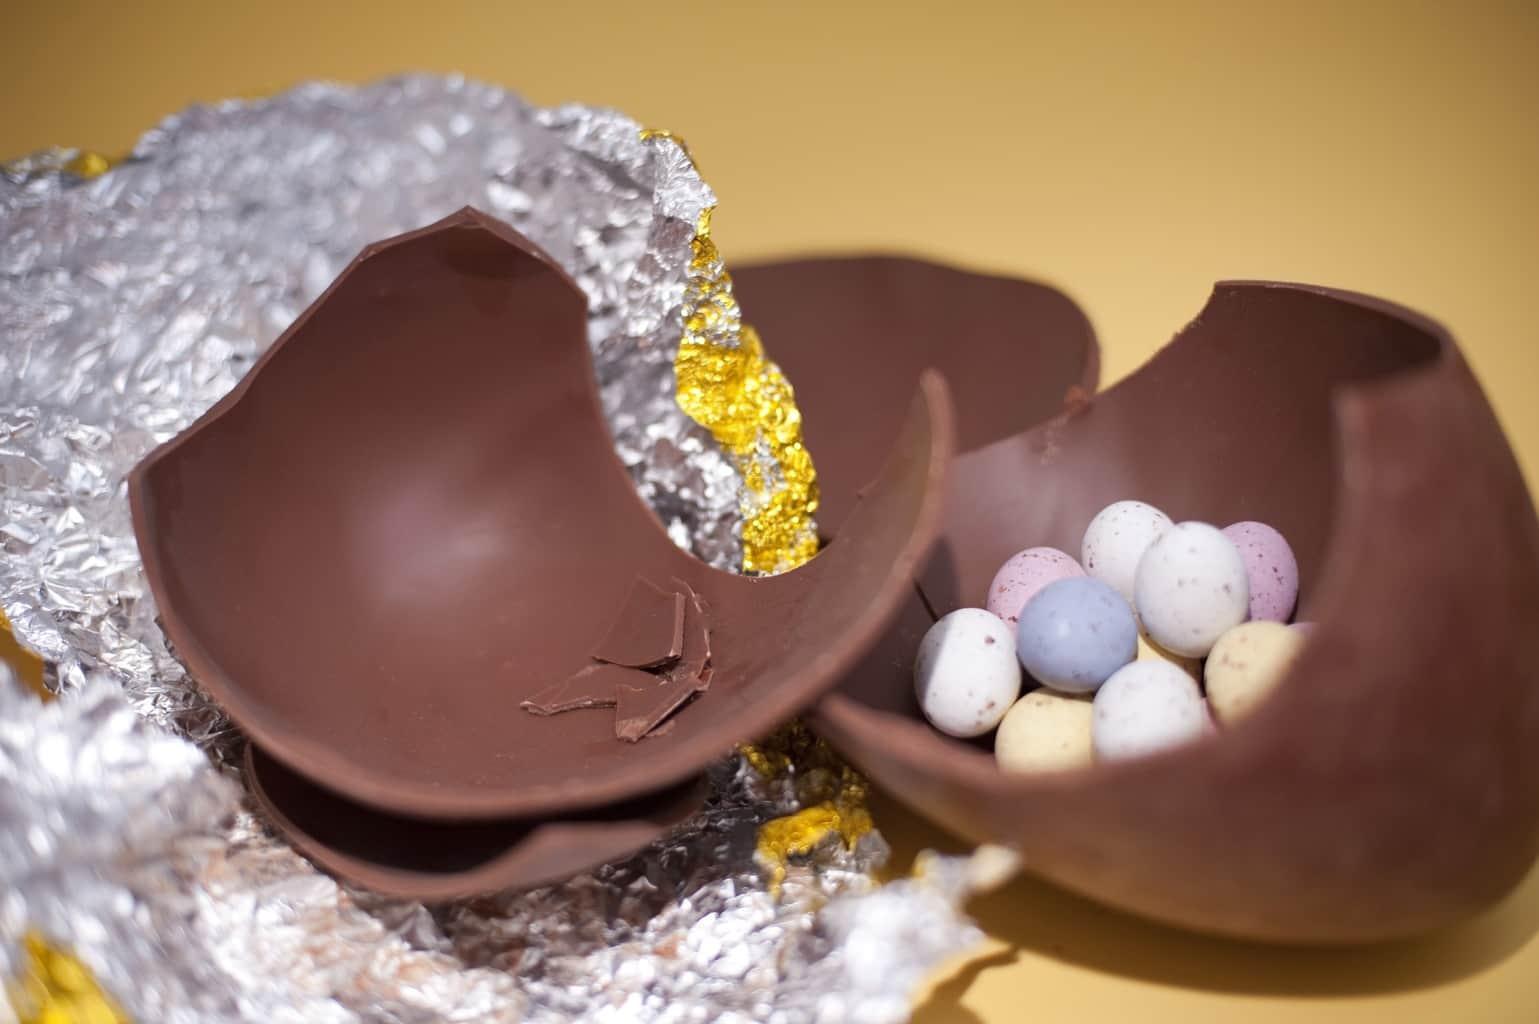 Happy Chocolate Day!